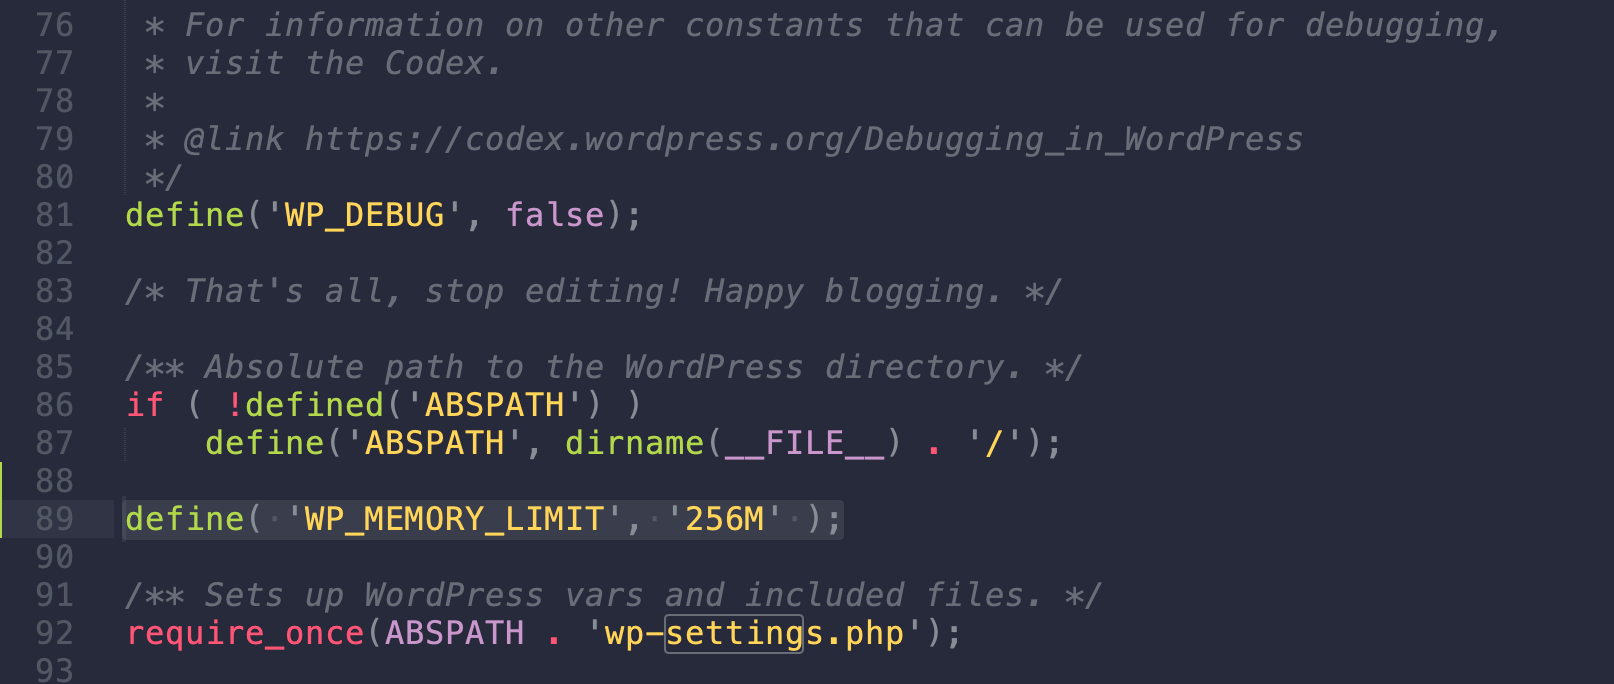 WP_MEMORY_LIMIT i wp-config.php